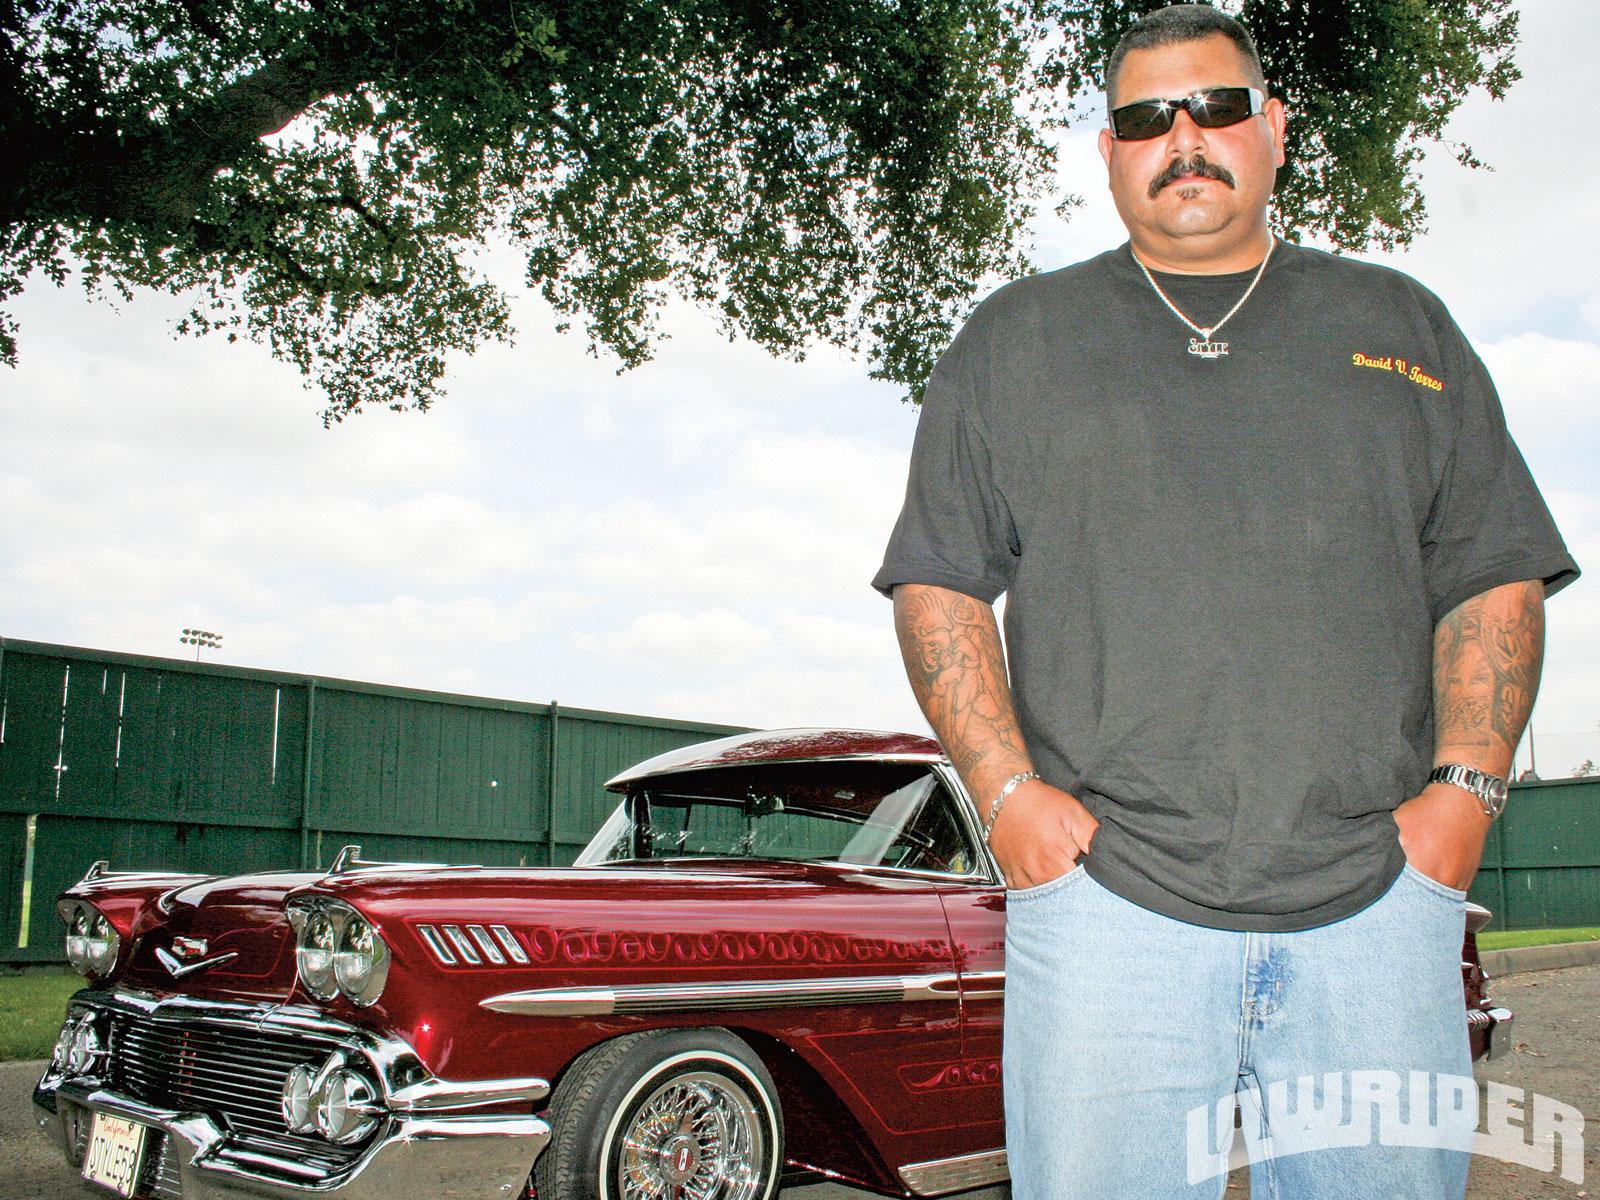 '58 Impala - David Torres